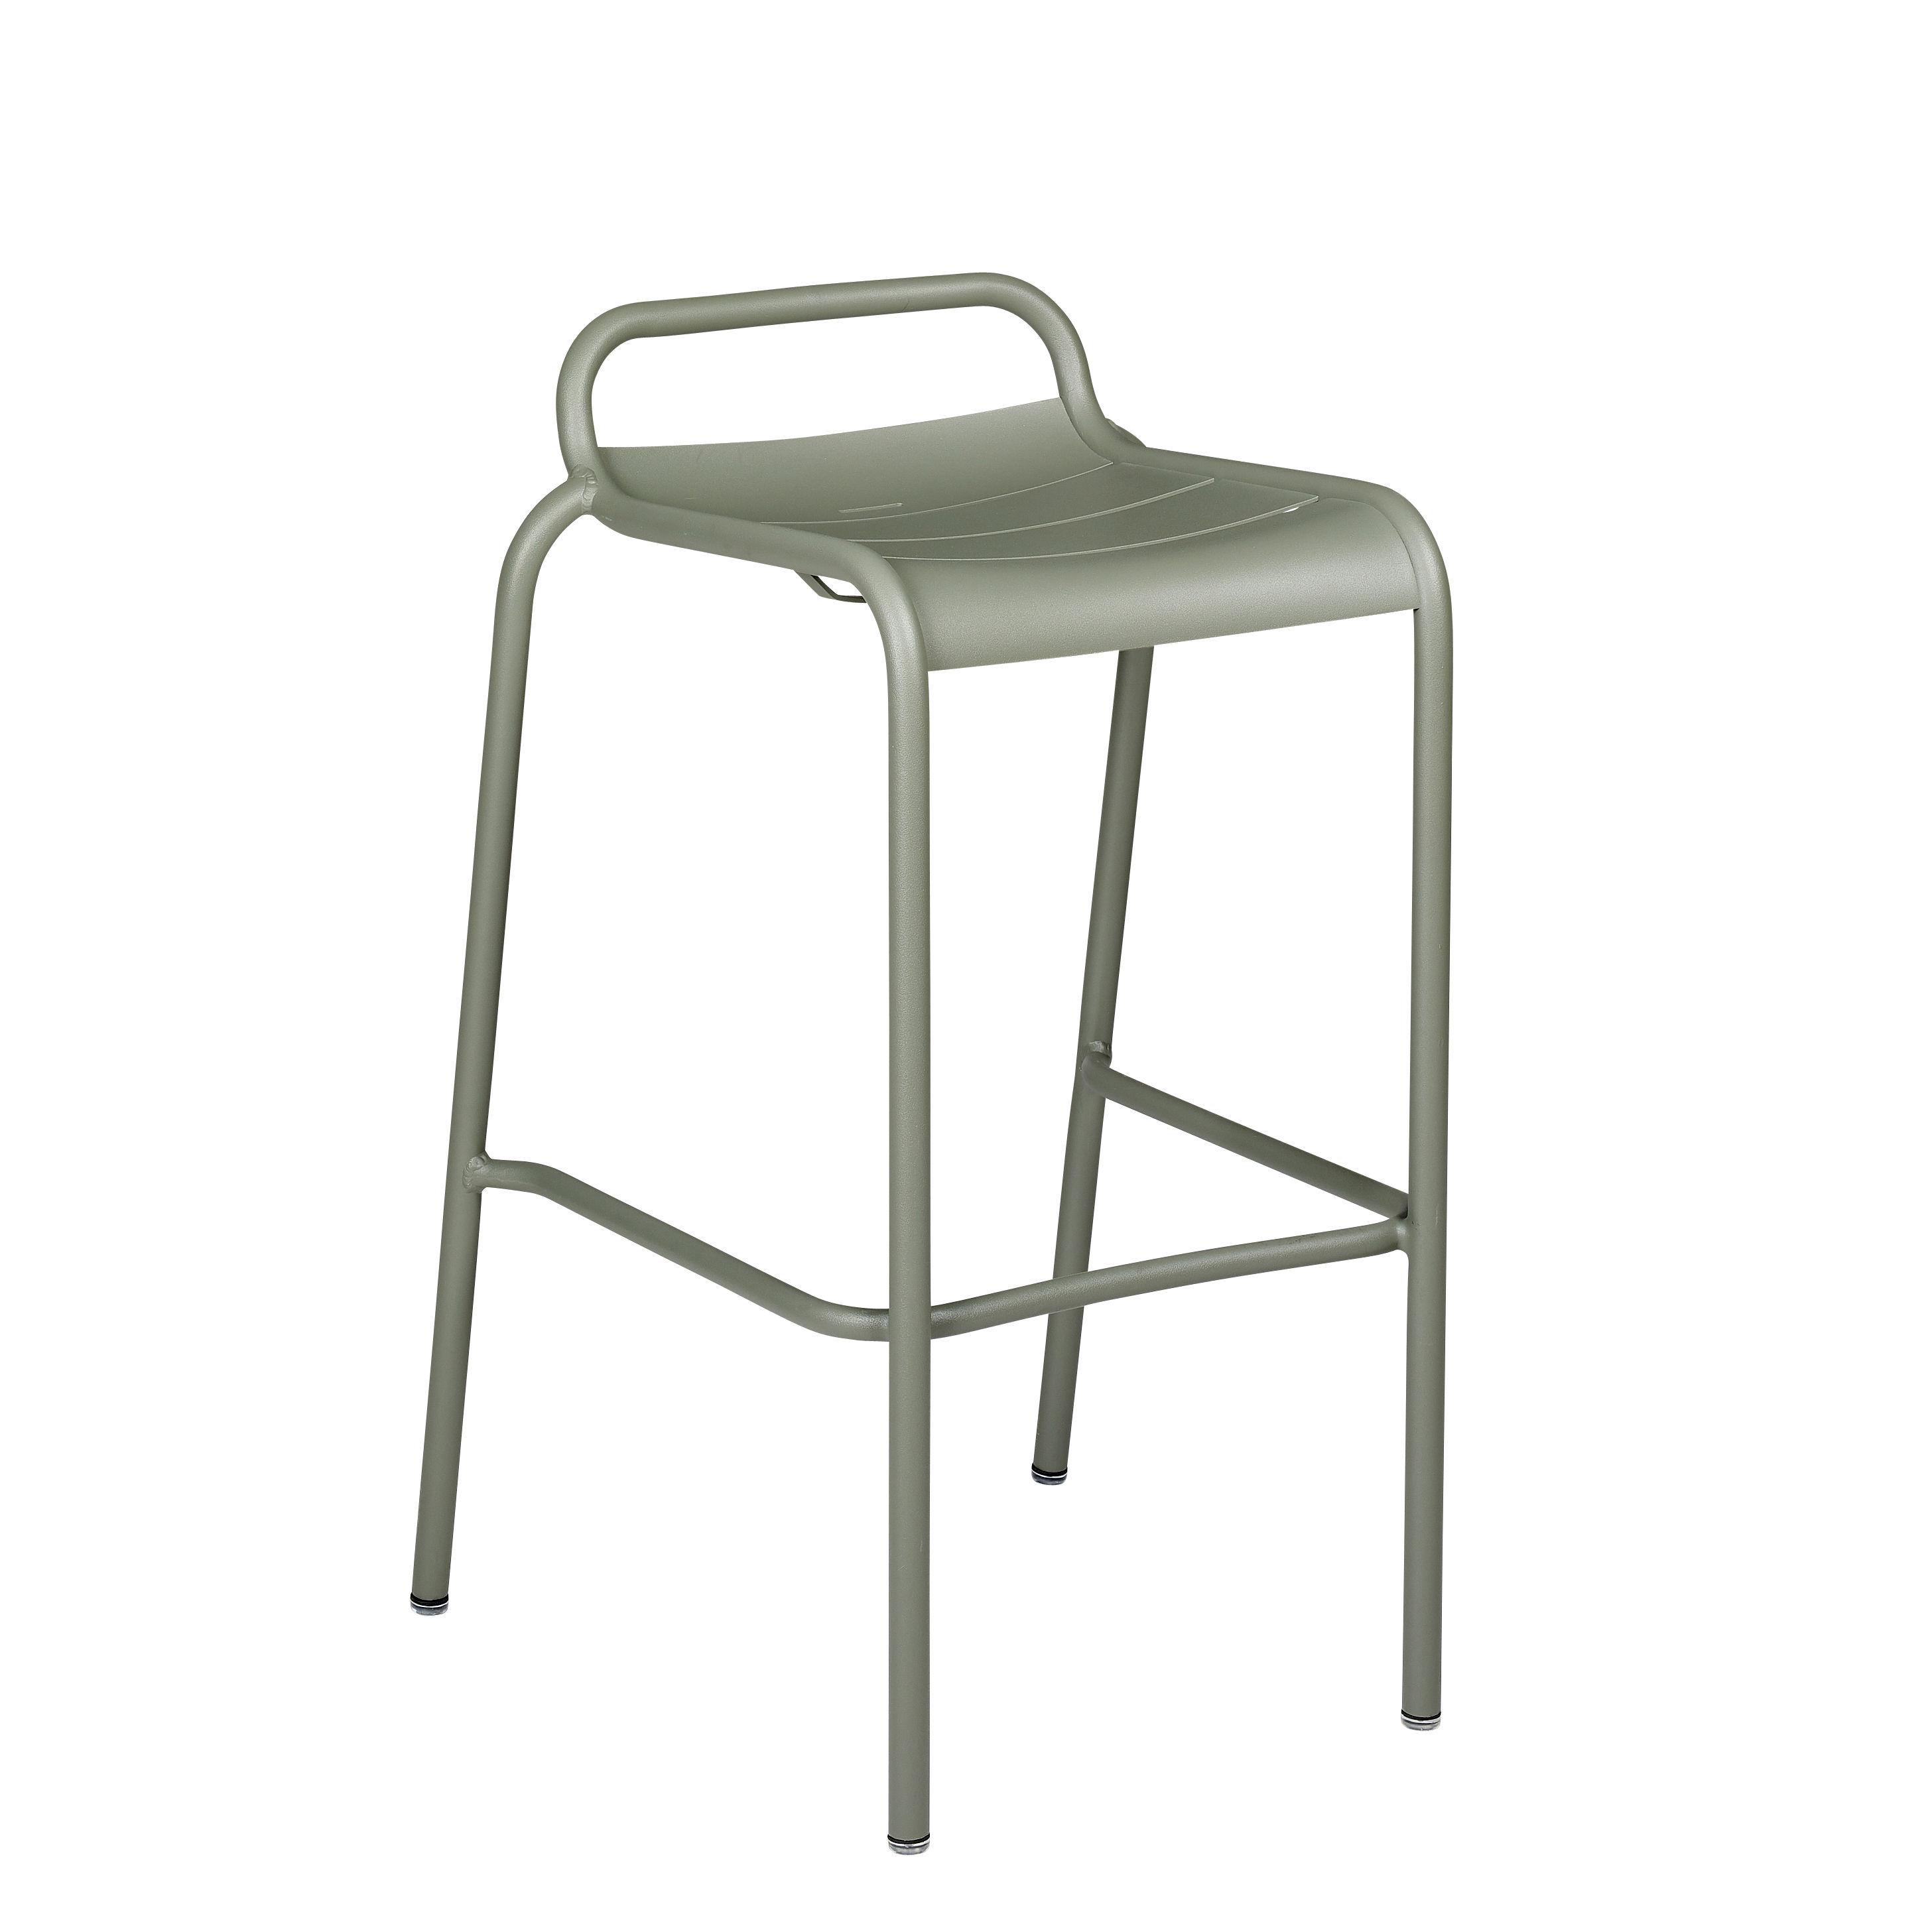 Möbel - Barhocker - Luxembourg Barhocker / Aluminium - H 78 cm - Fermob - Kaktus - bemaltes Aluminium